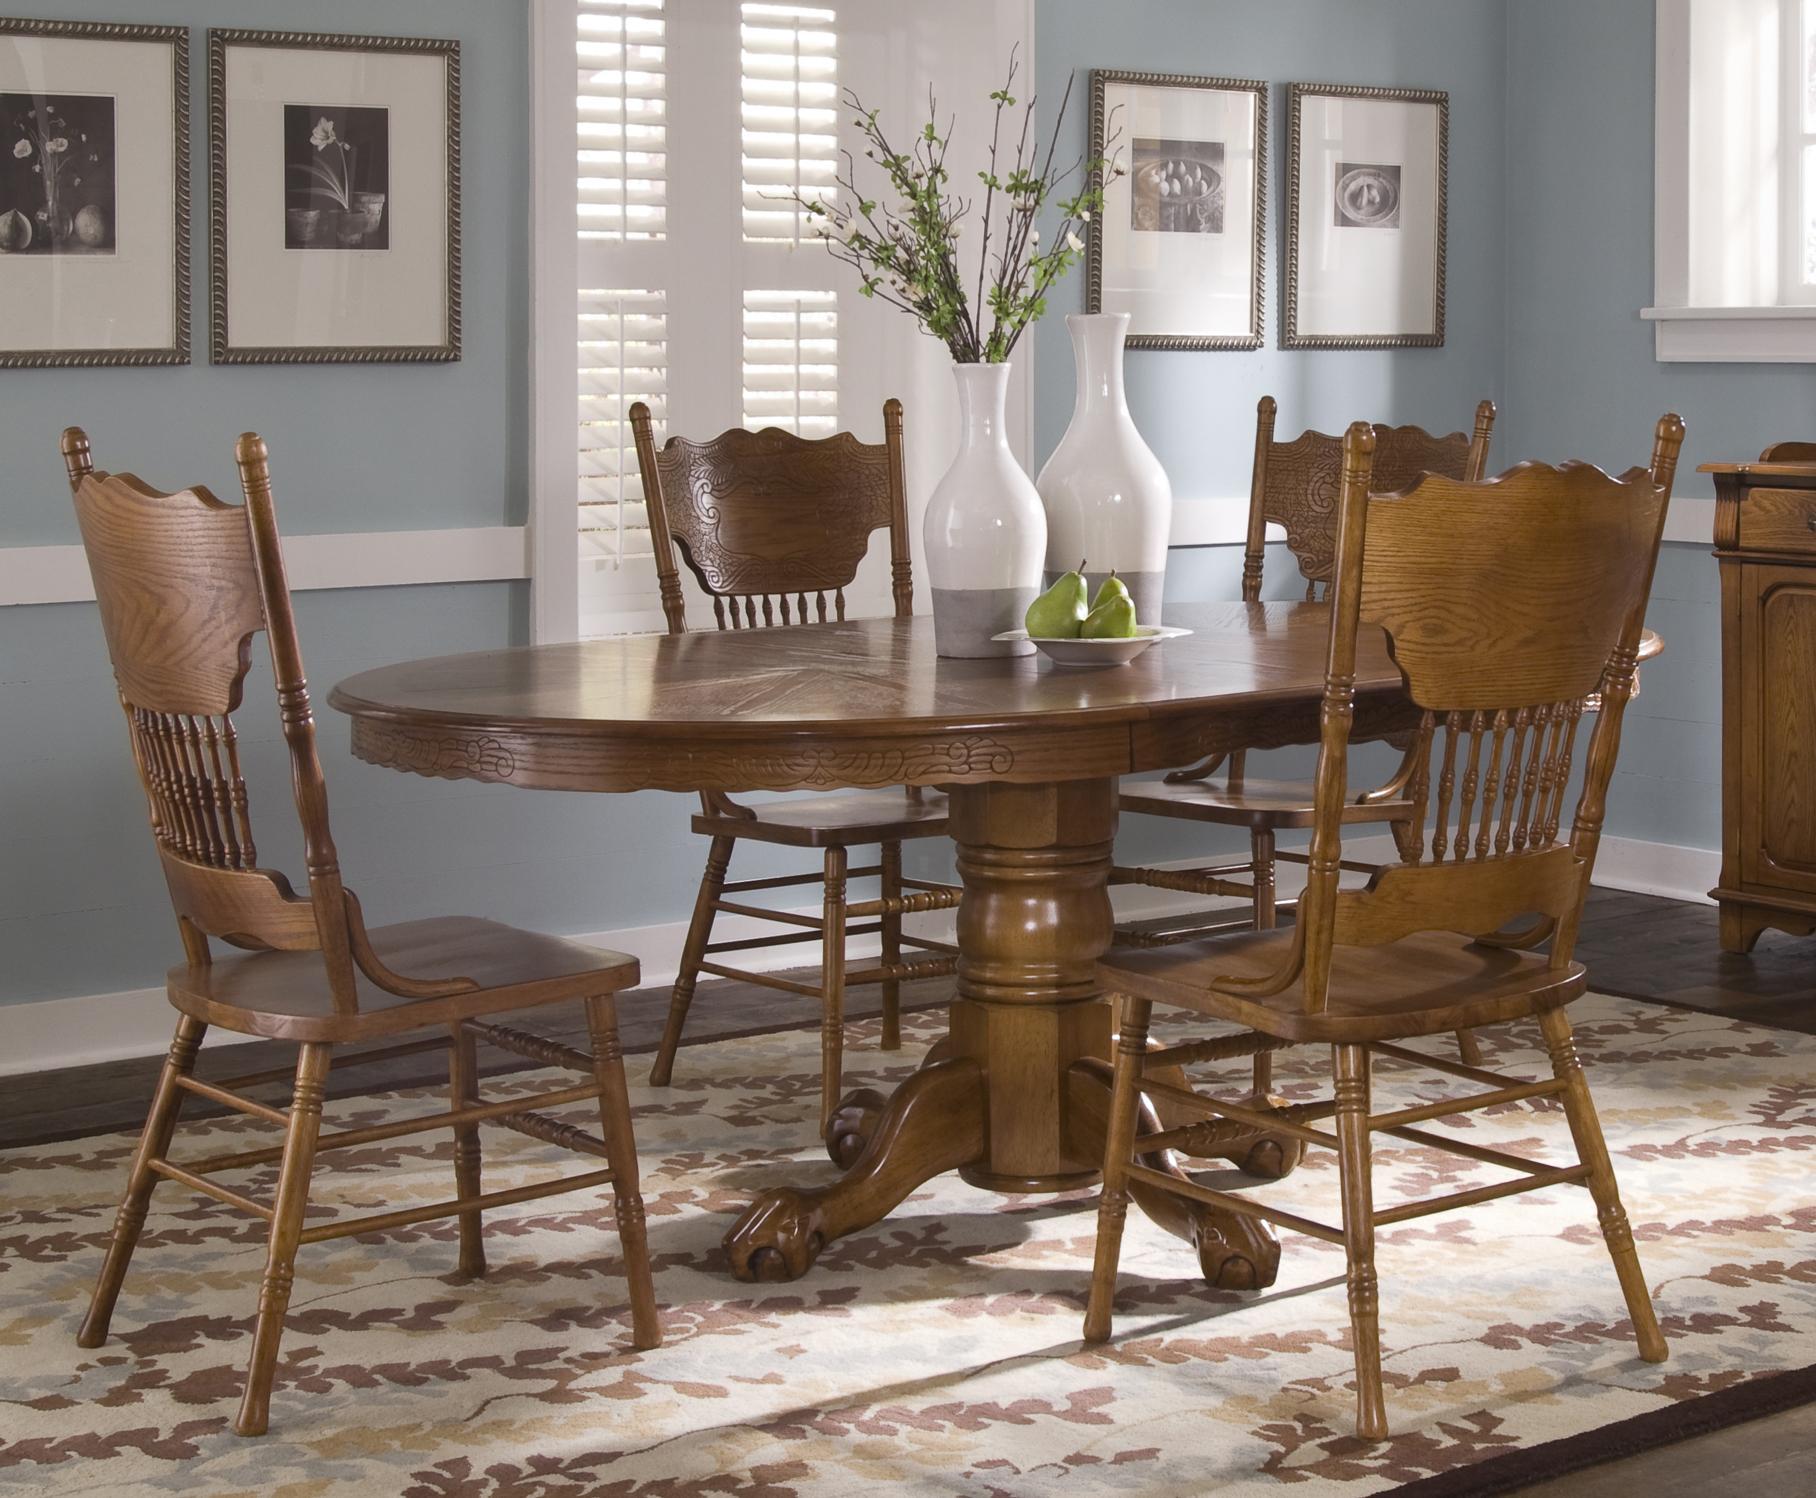 https://images.furnituredealer.net/img/collections%2Fliberty_furniture%2Fnostalgia%20lf_10-kop-b1.jpg